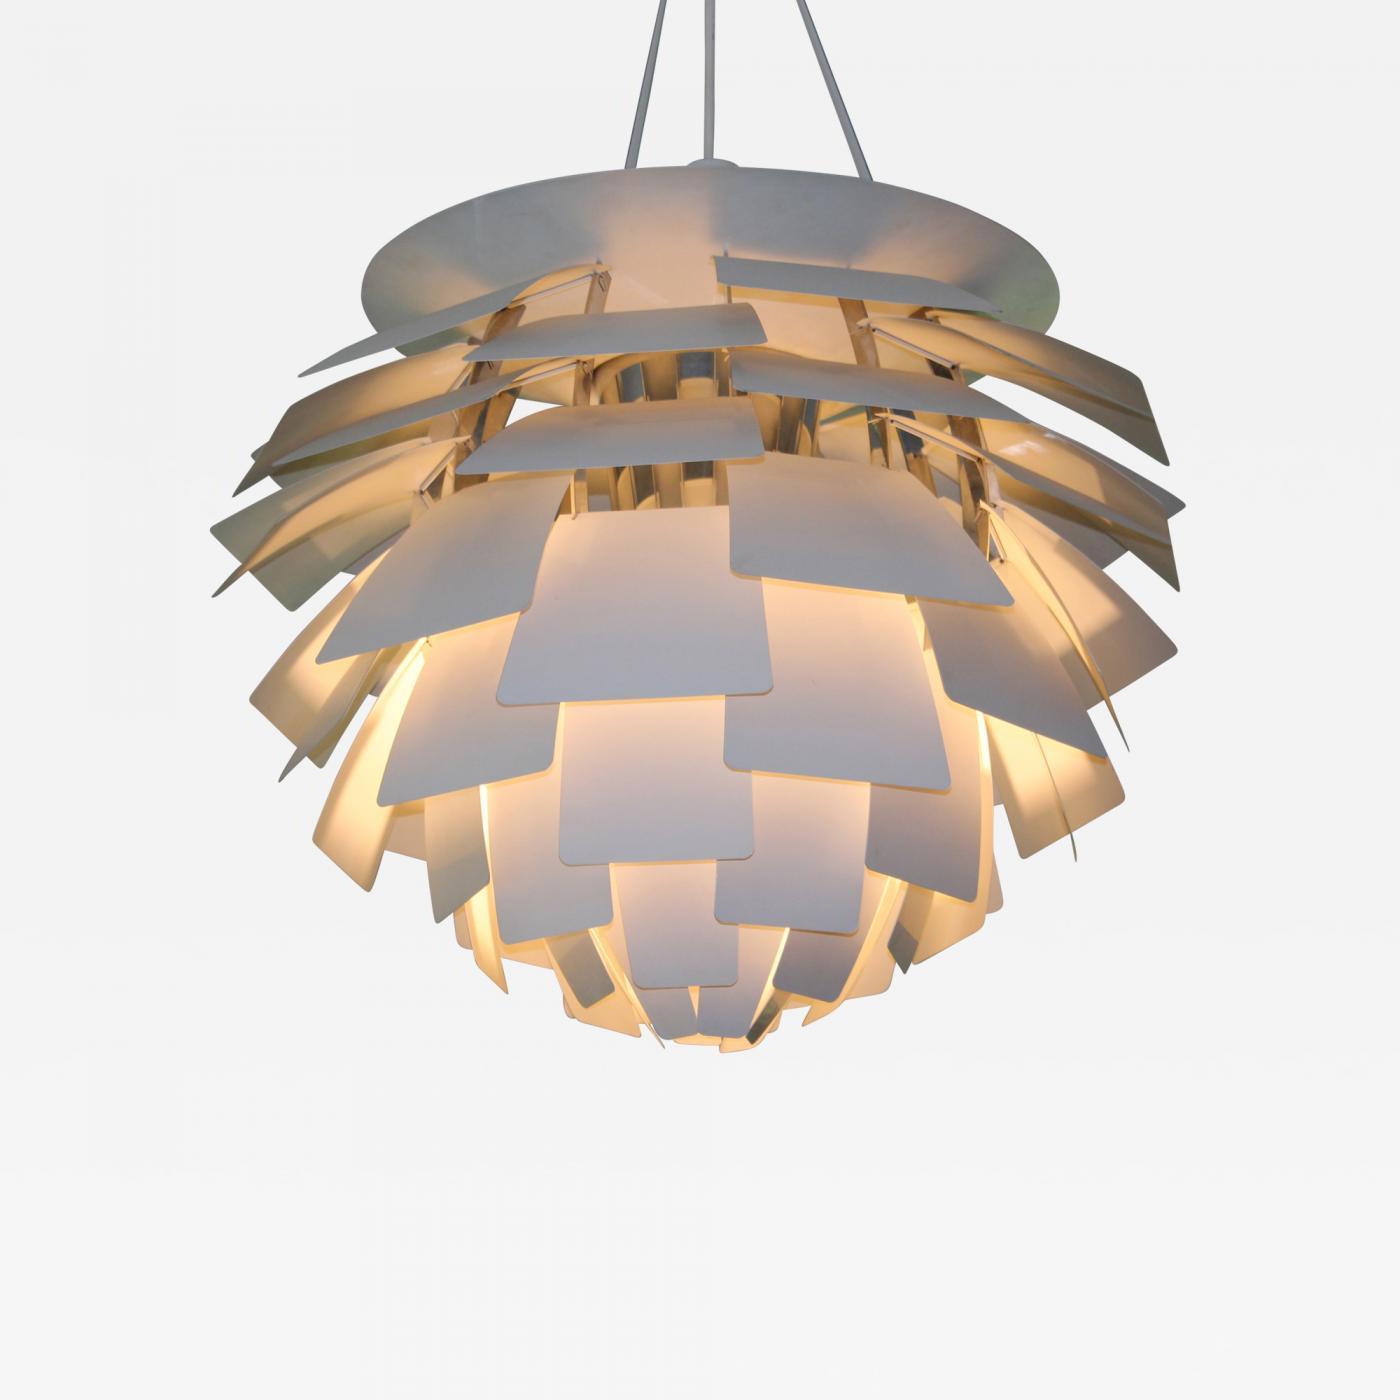 Louis poulsen artichoke pendant light listings furniture lighting chandeliers and pendants louis poulsen artichoke pendant light aloadofball Choice Image